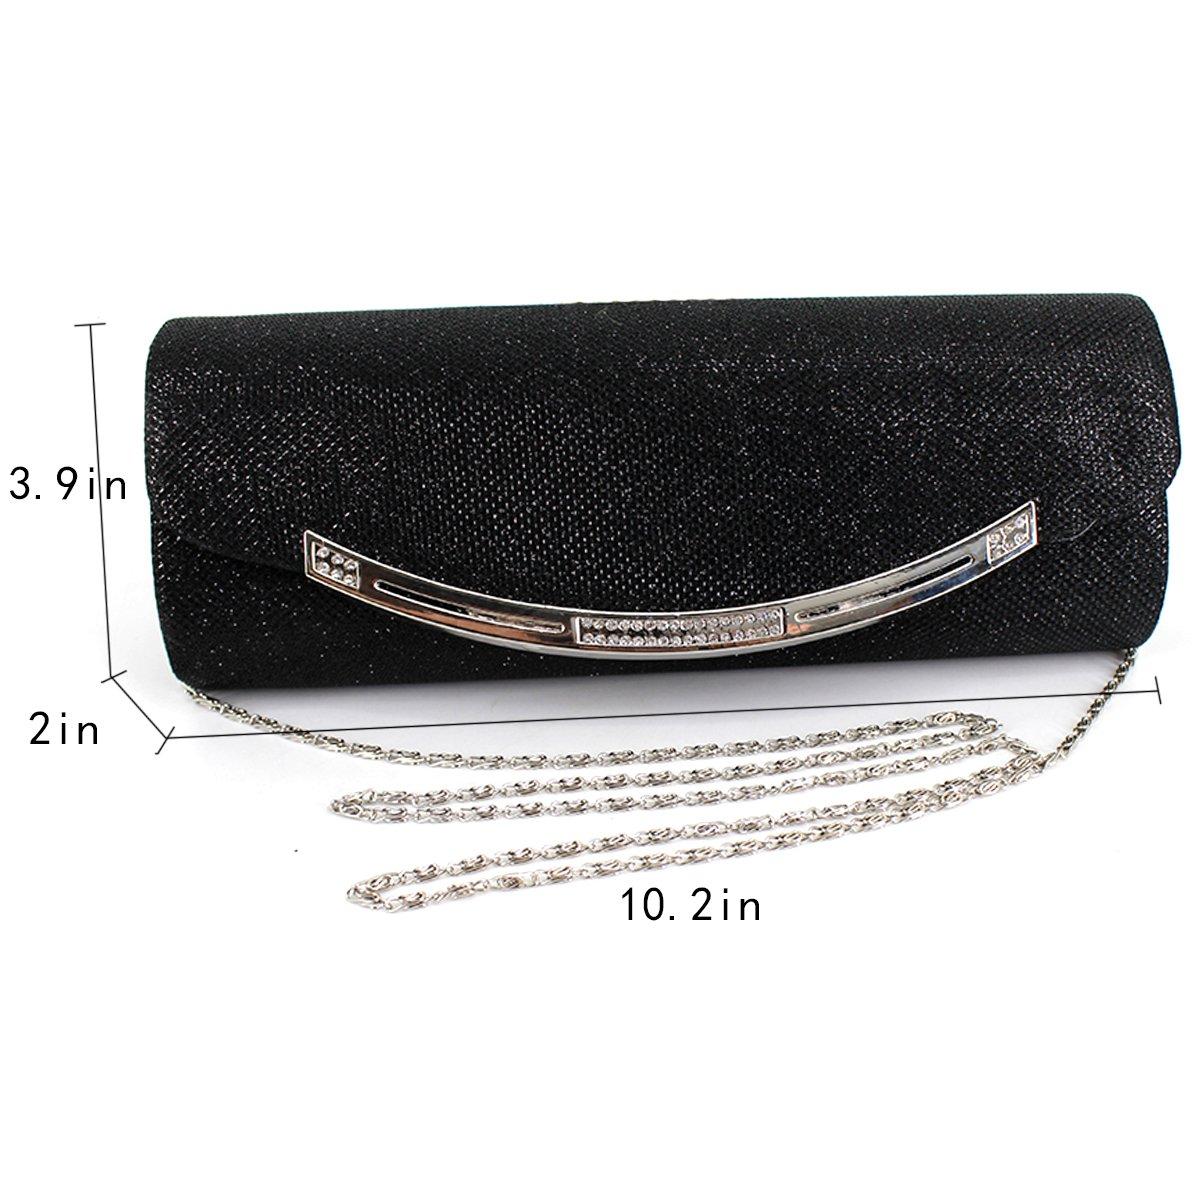 Heidi Bag Glitter Sequin Clutch Purse Evening Bag Wedding Ball Prom Clutch  Chain Shoulder Bag  Handbags  Amazon.com e05668452aa9